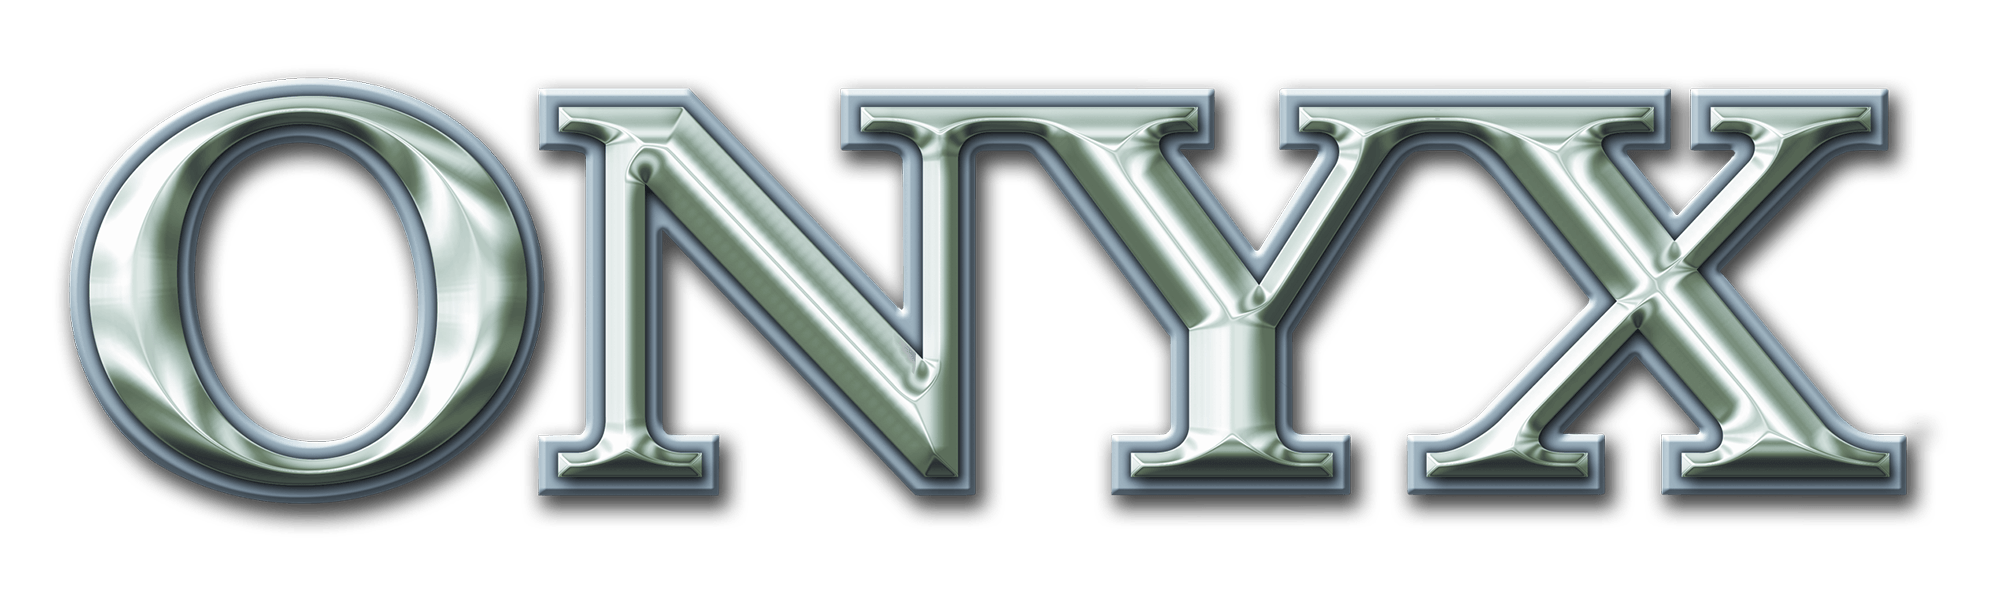 Onyx Finance